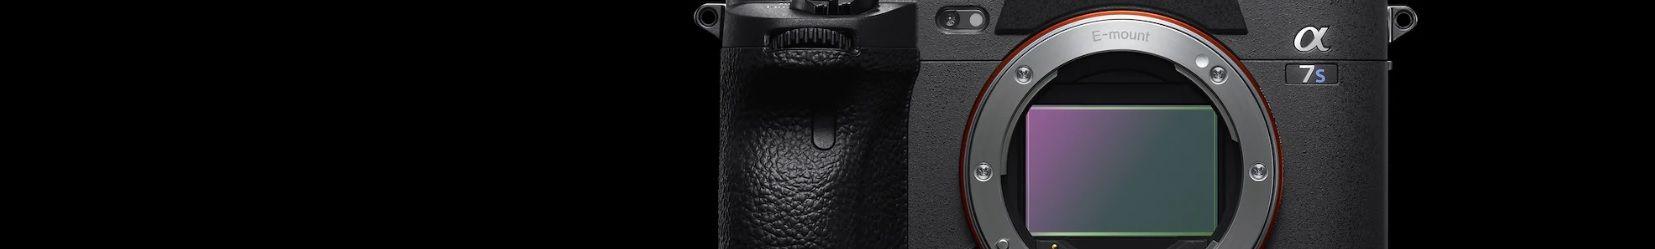 Sony Alpha 7S III - boîtier nu image 3 | Rakuten